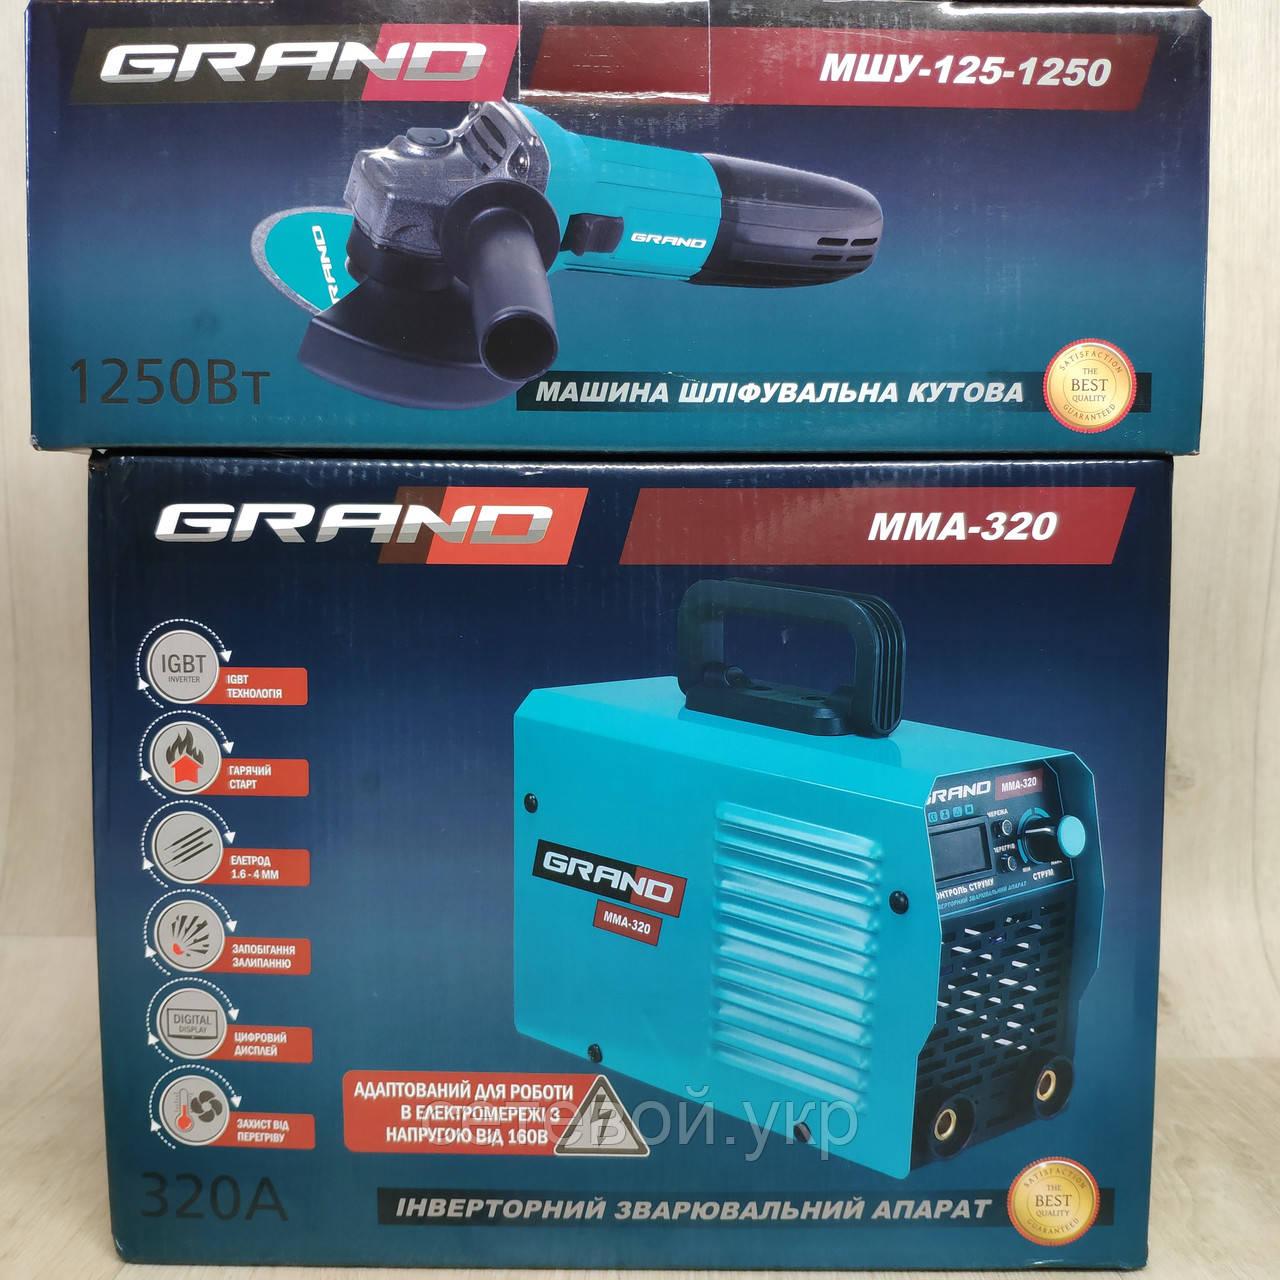 Зварювальний апарат Grand ММА-320 + болгарка